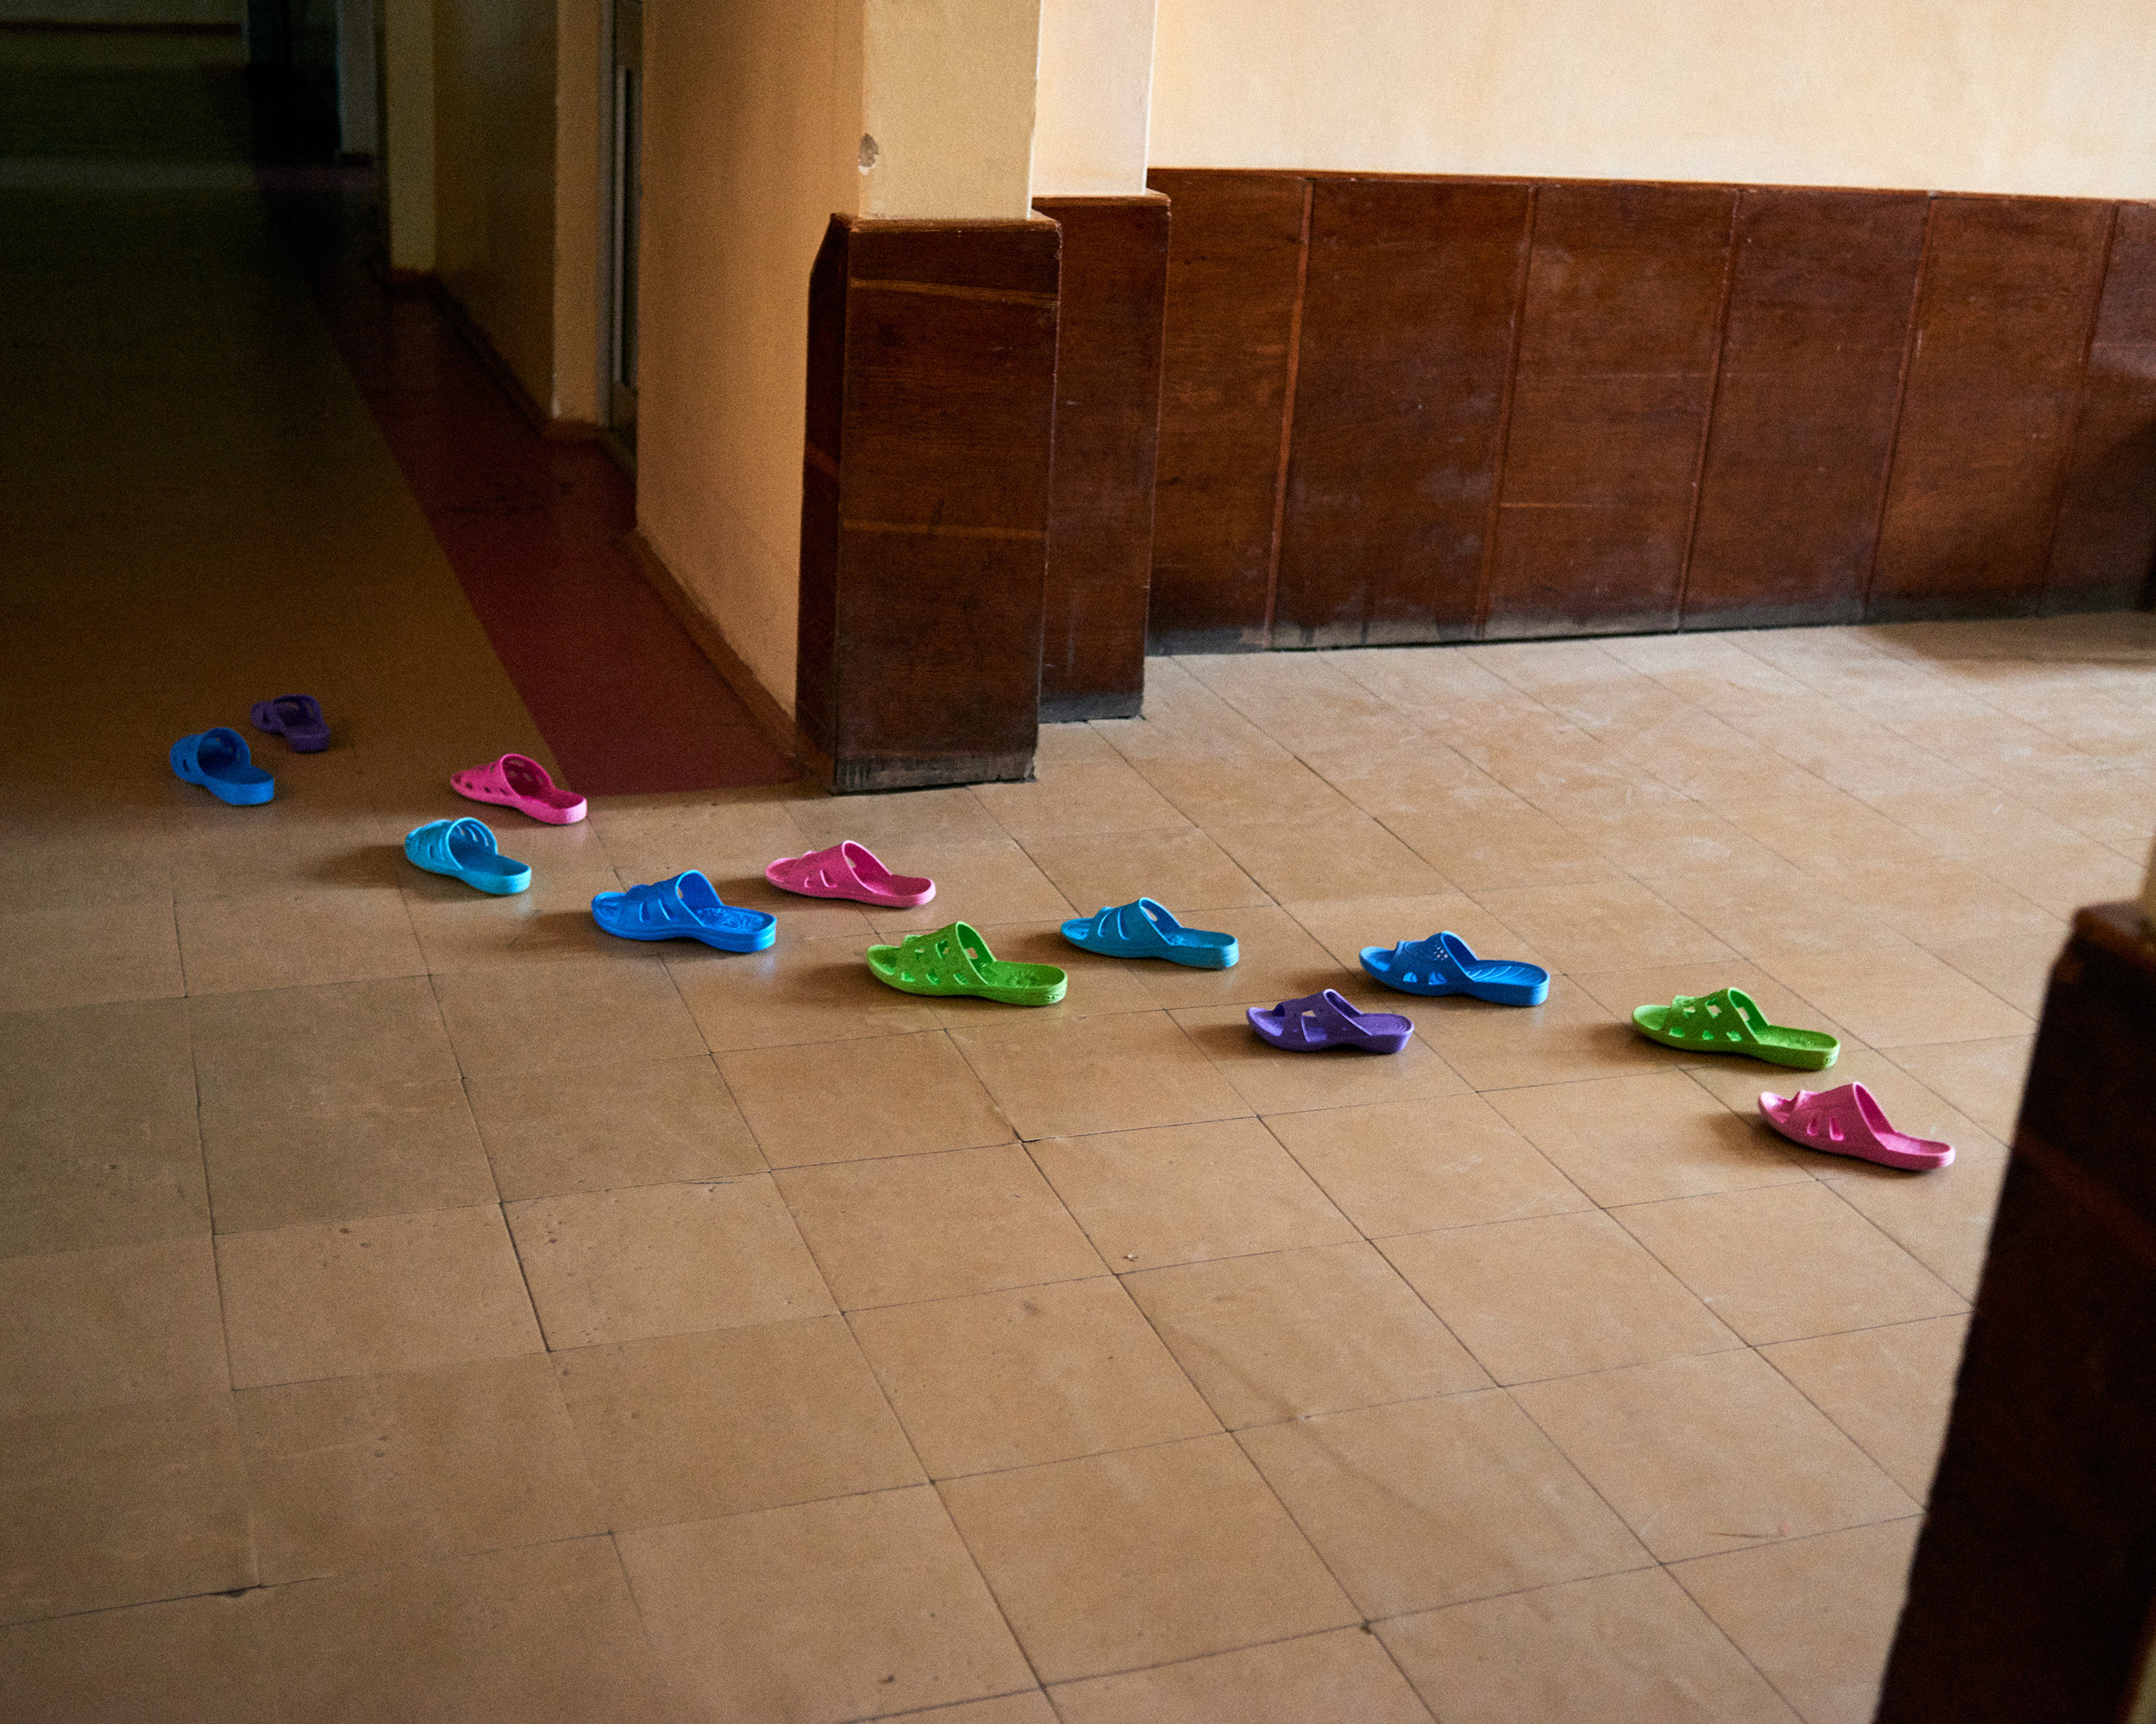 orphanage_130316_3968_master.jpg